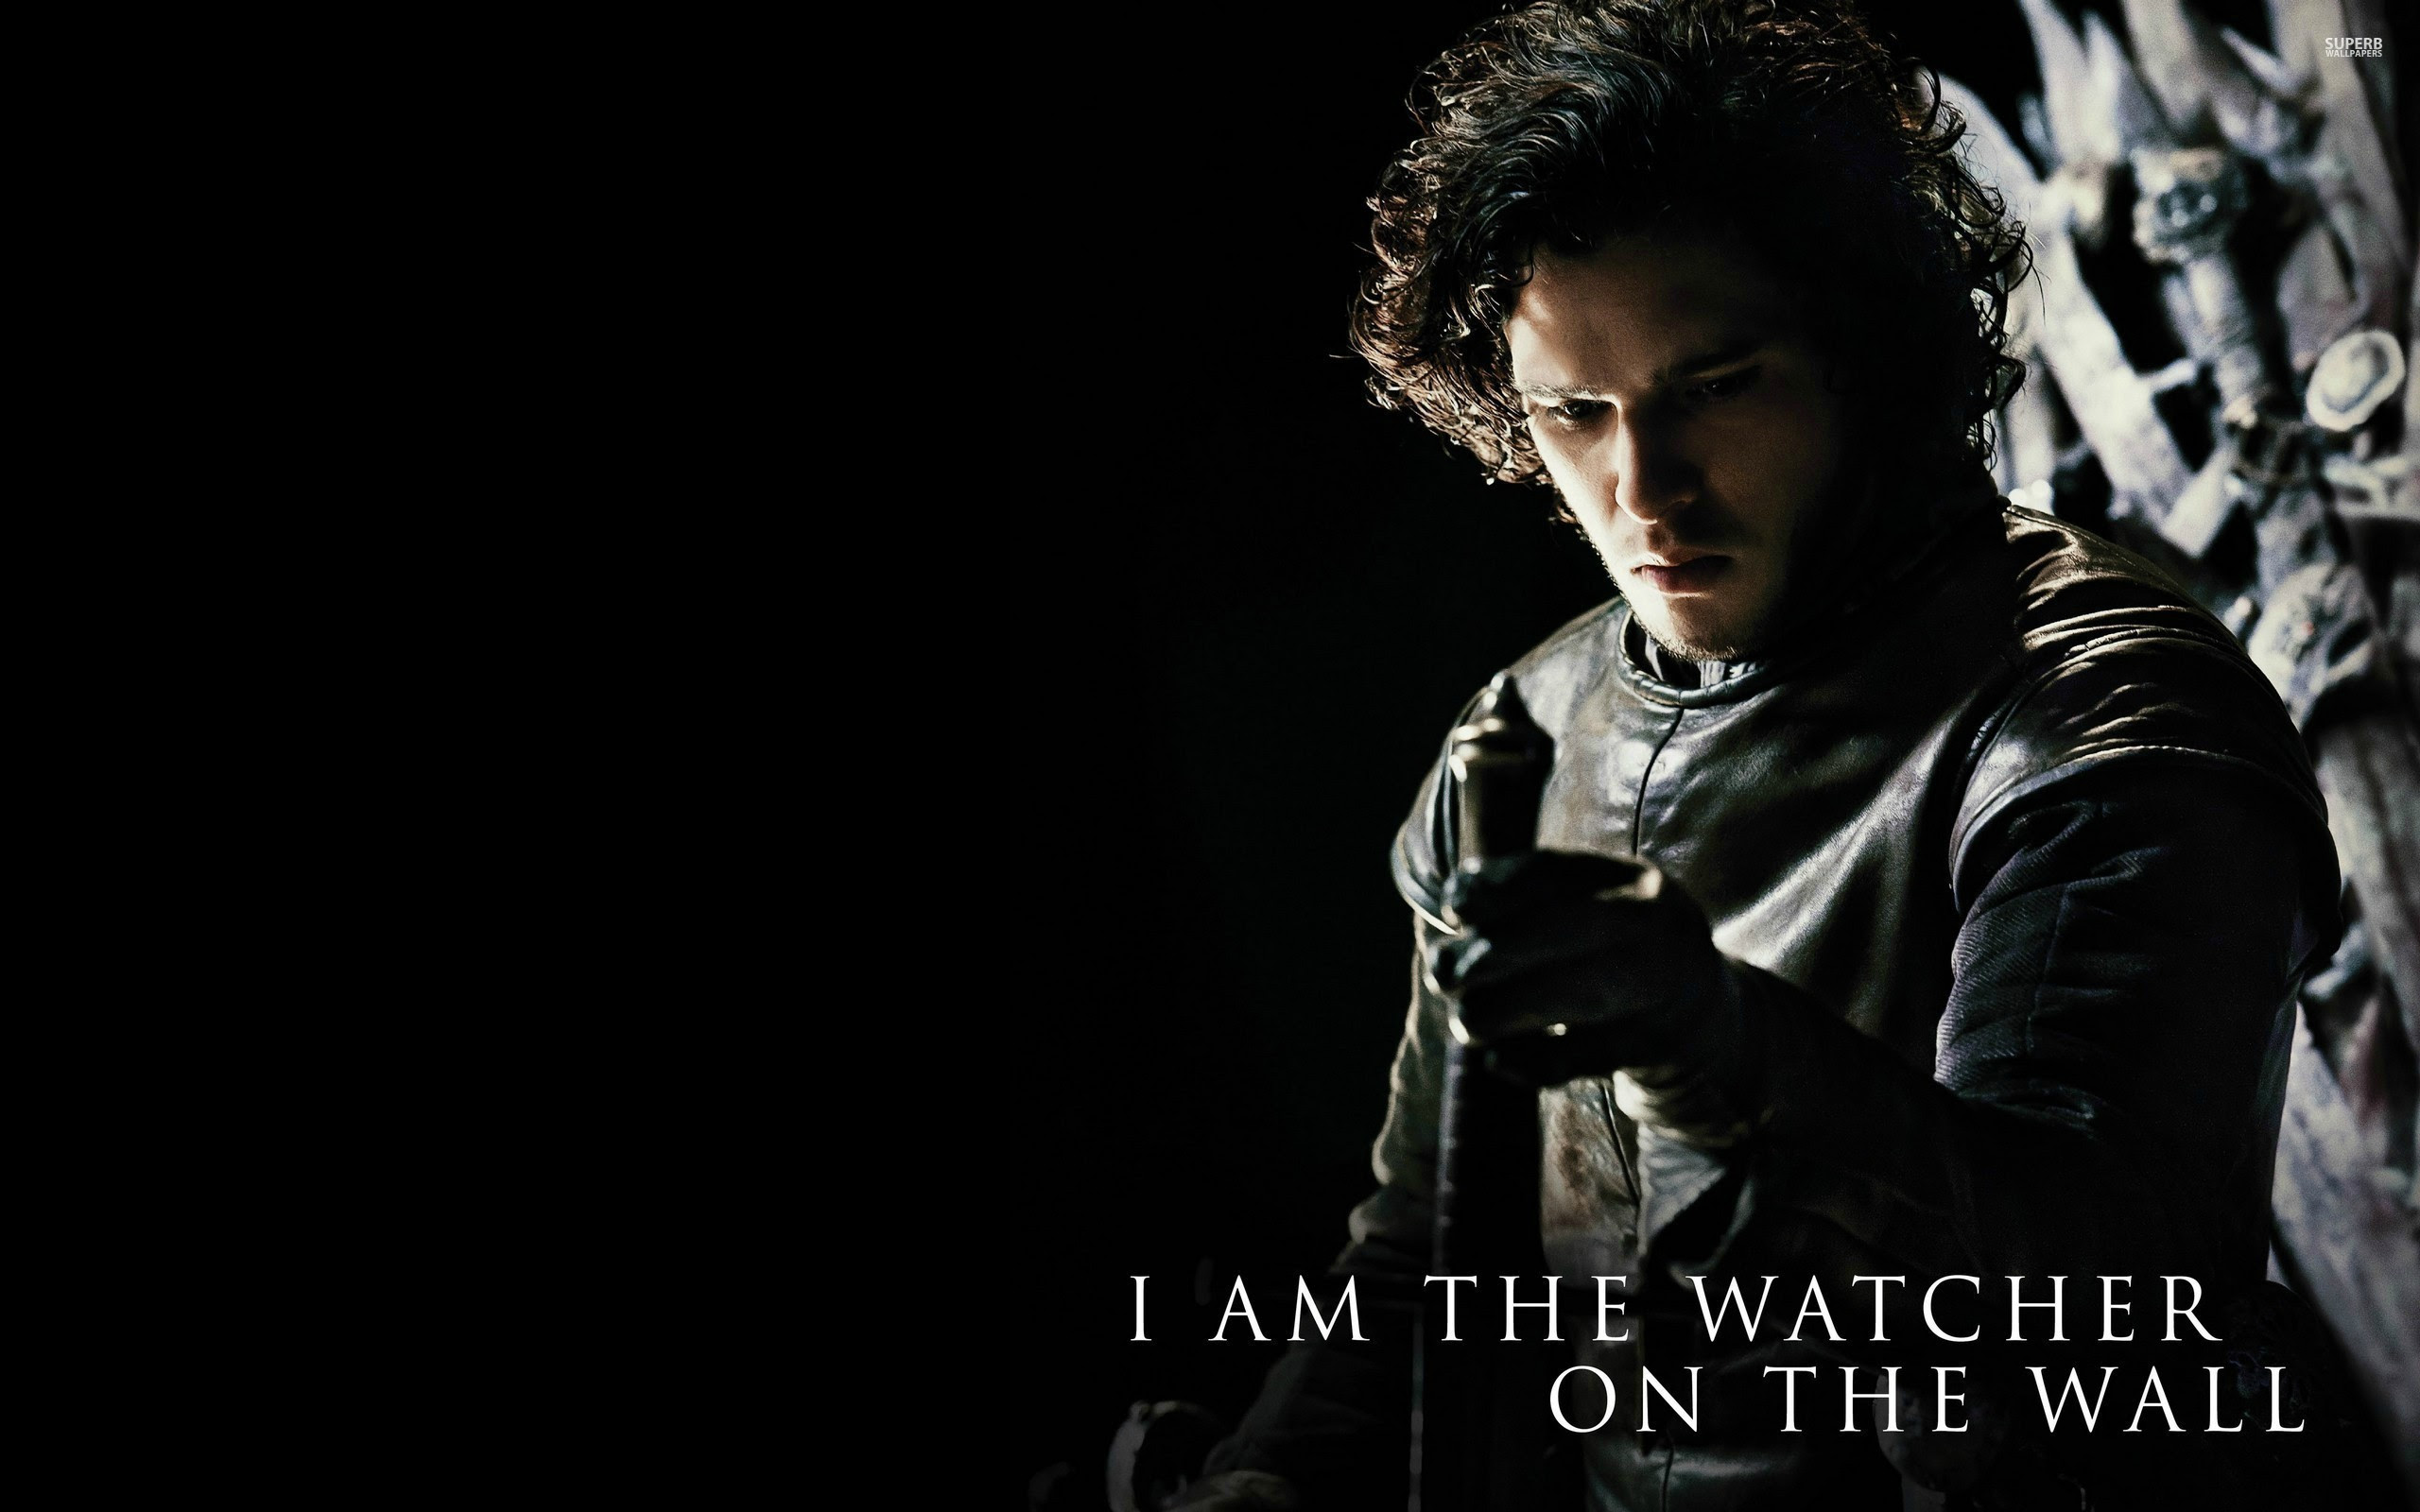 Game Of Thrones Jon Snow Wallpaper Hd